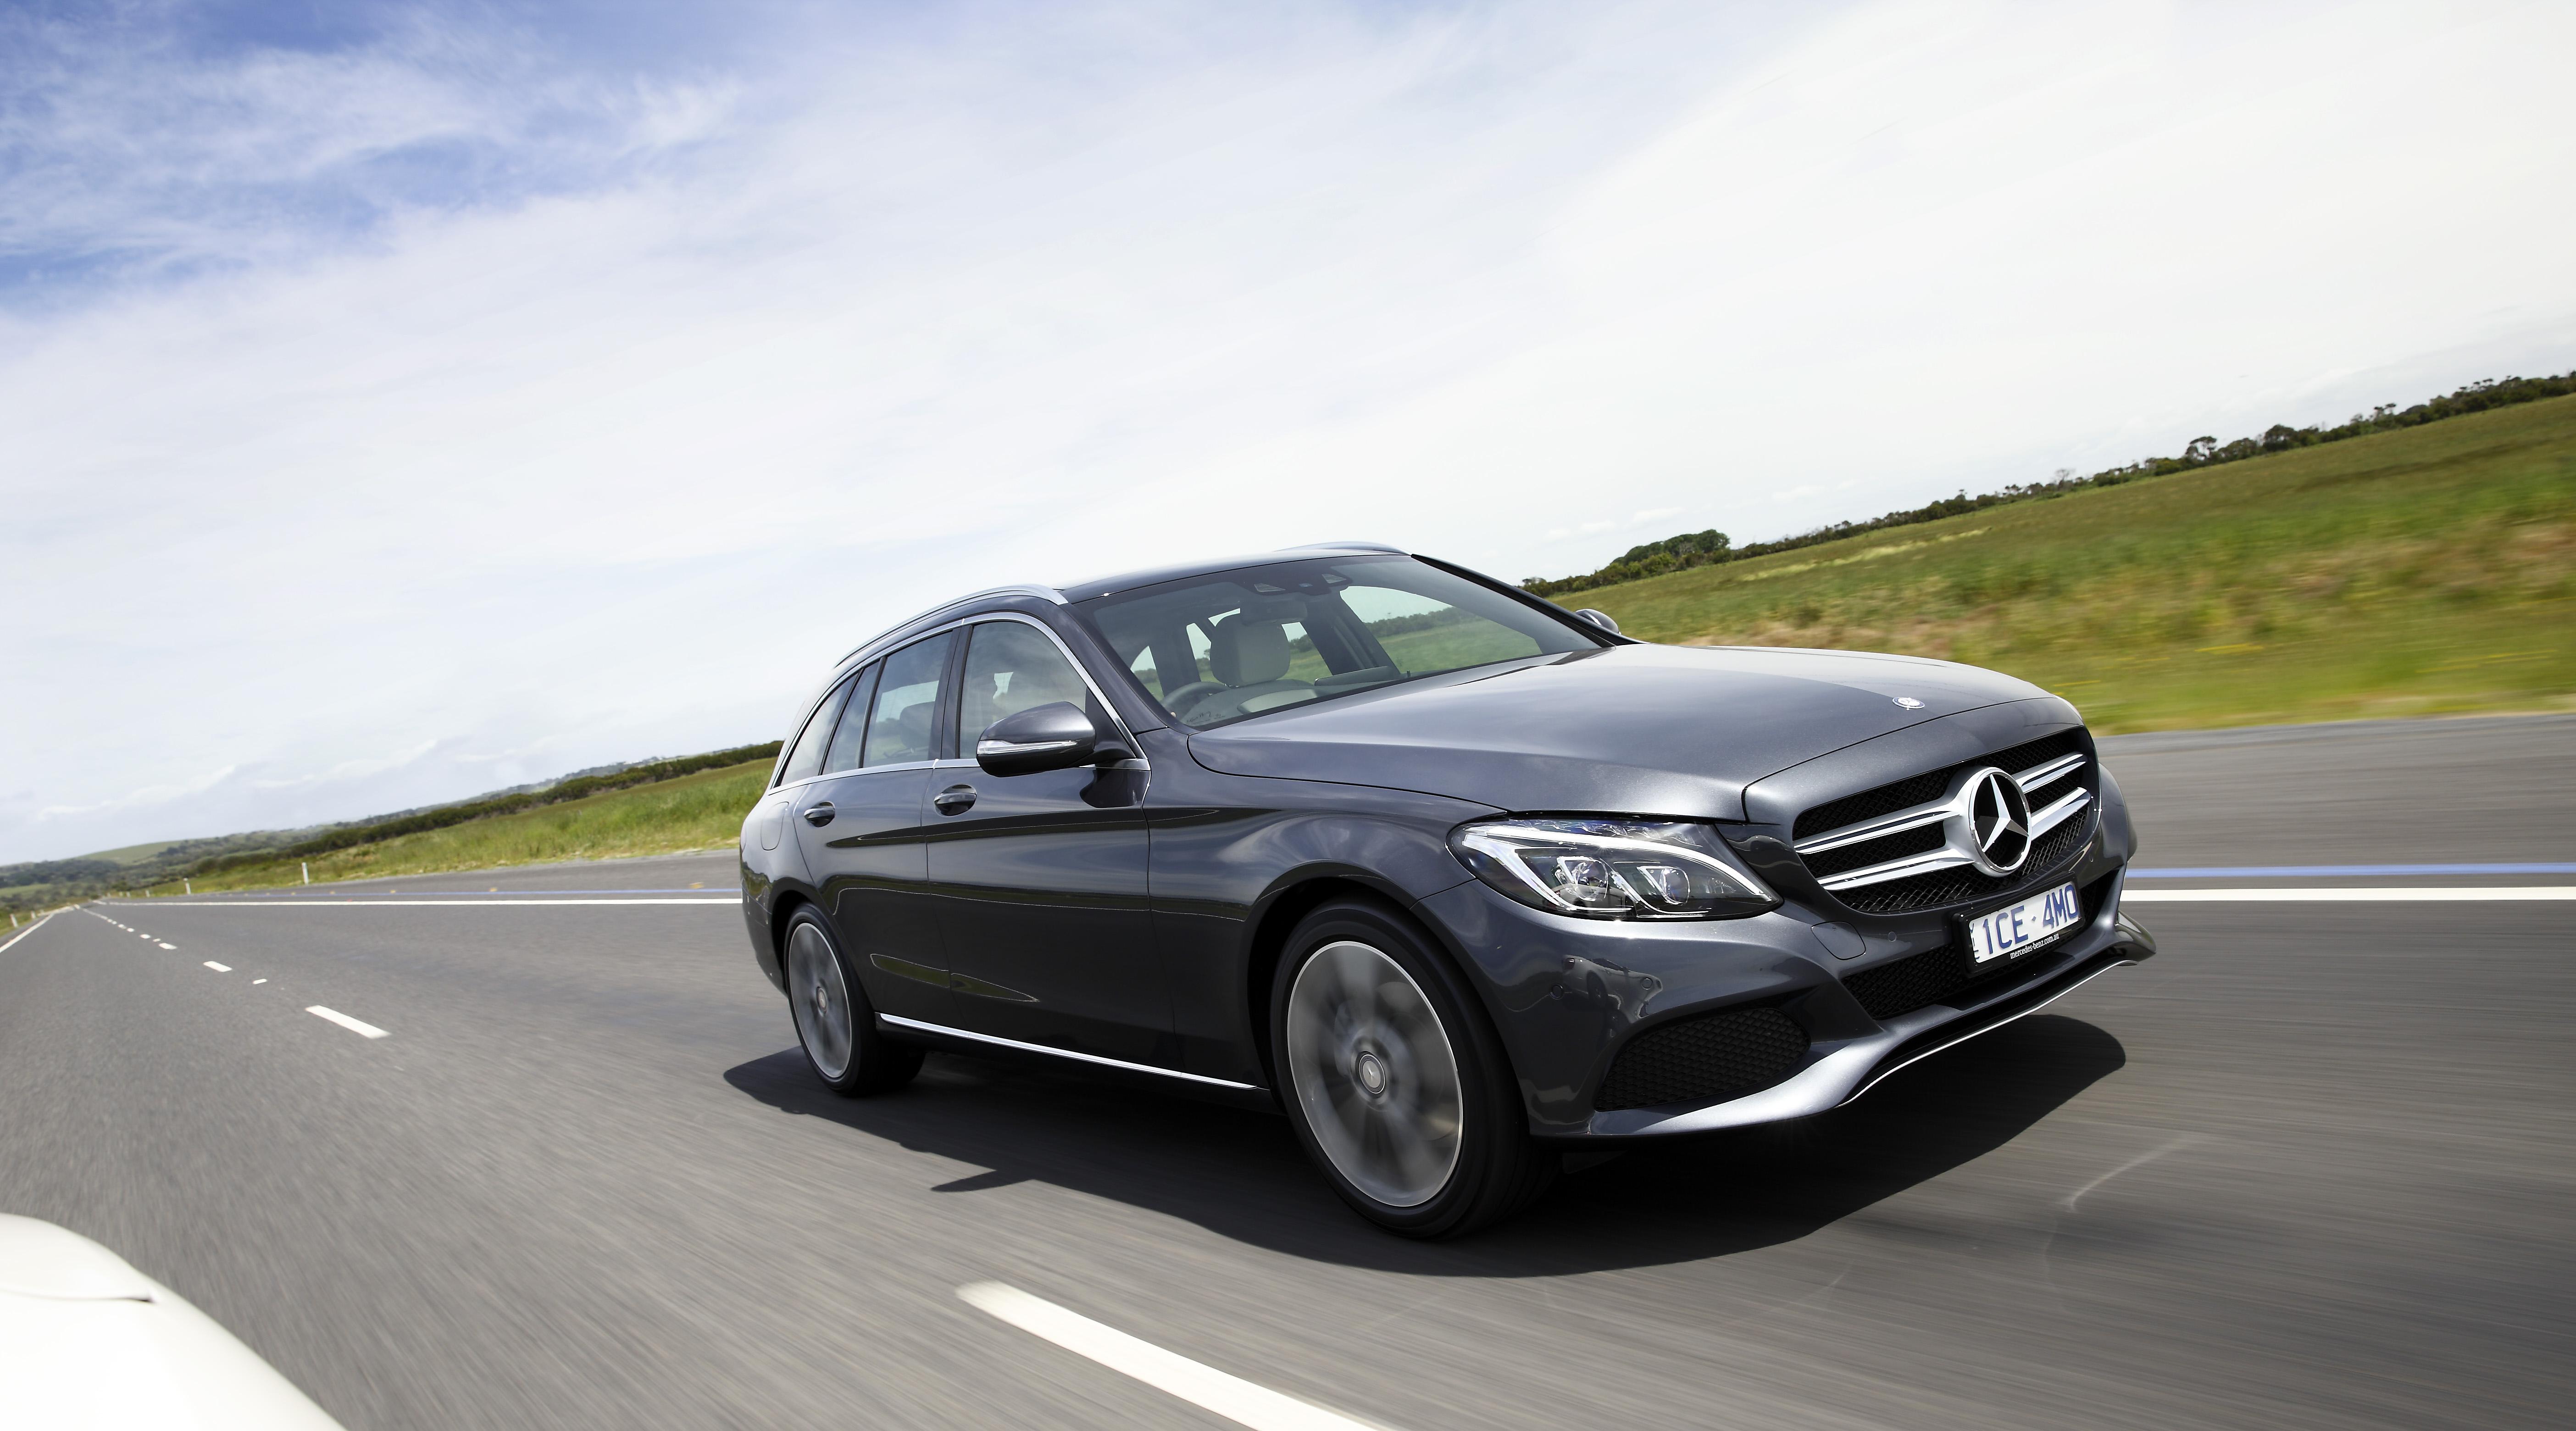 2015 Mercedes Benz C200 Estate Review Caradvice